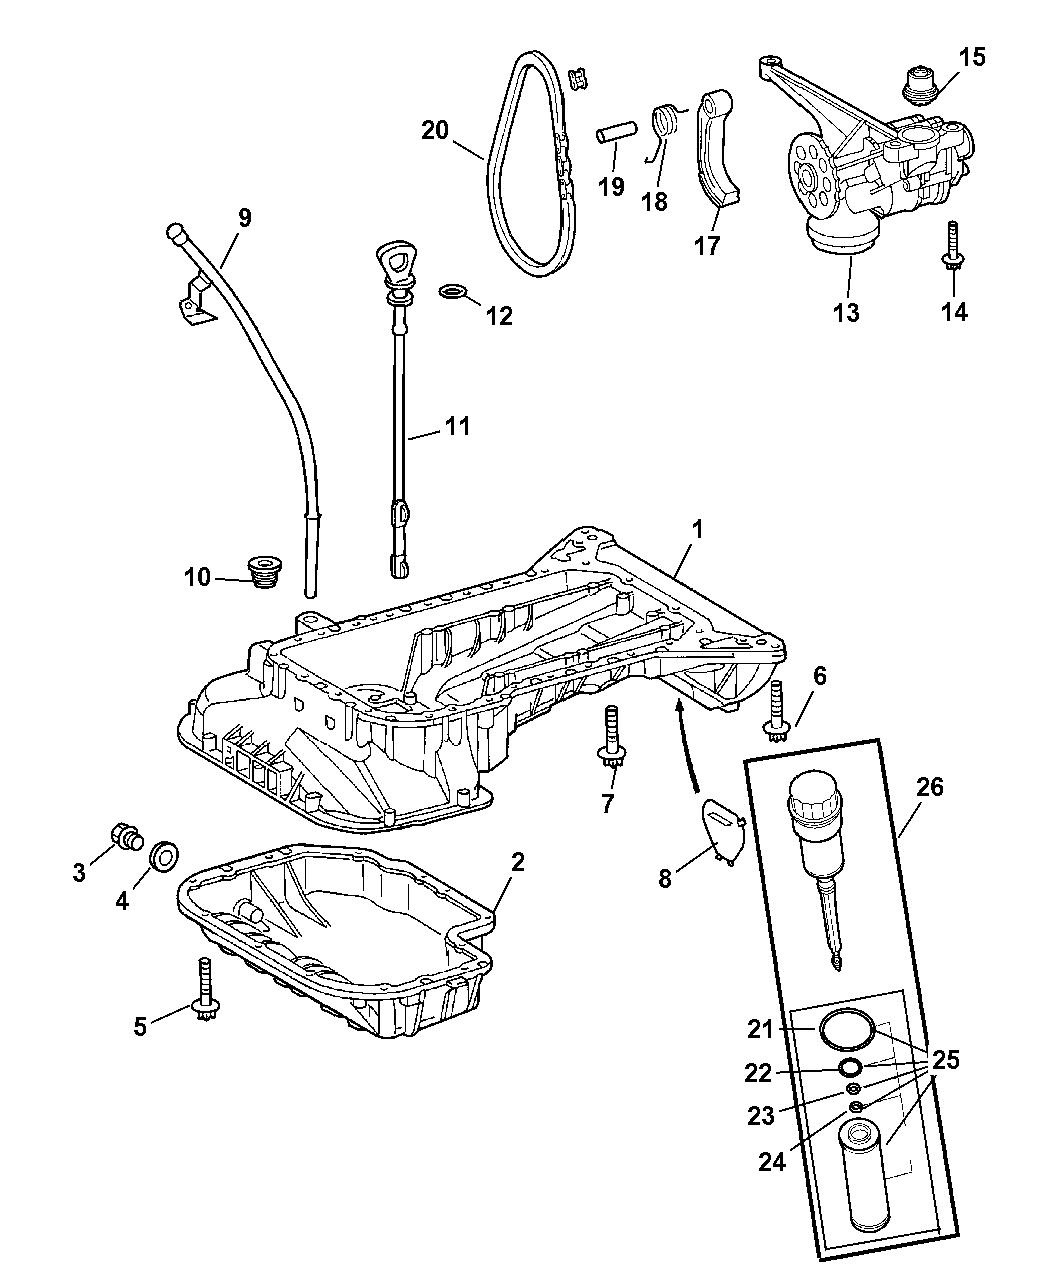 2004 Chrysler Crossfire Engine Oiling